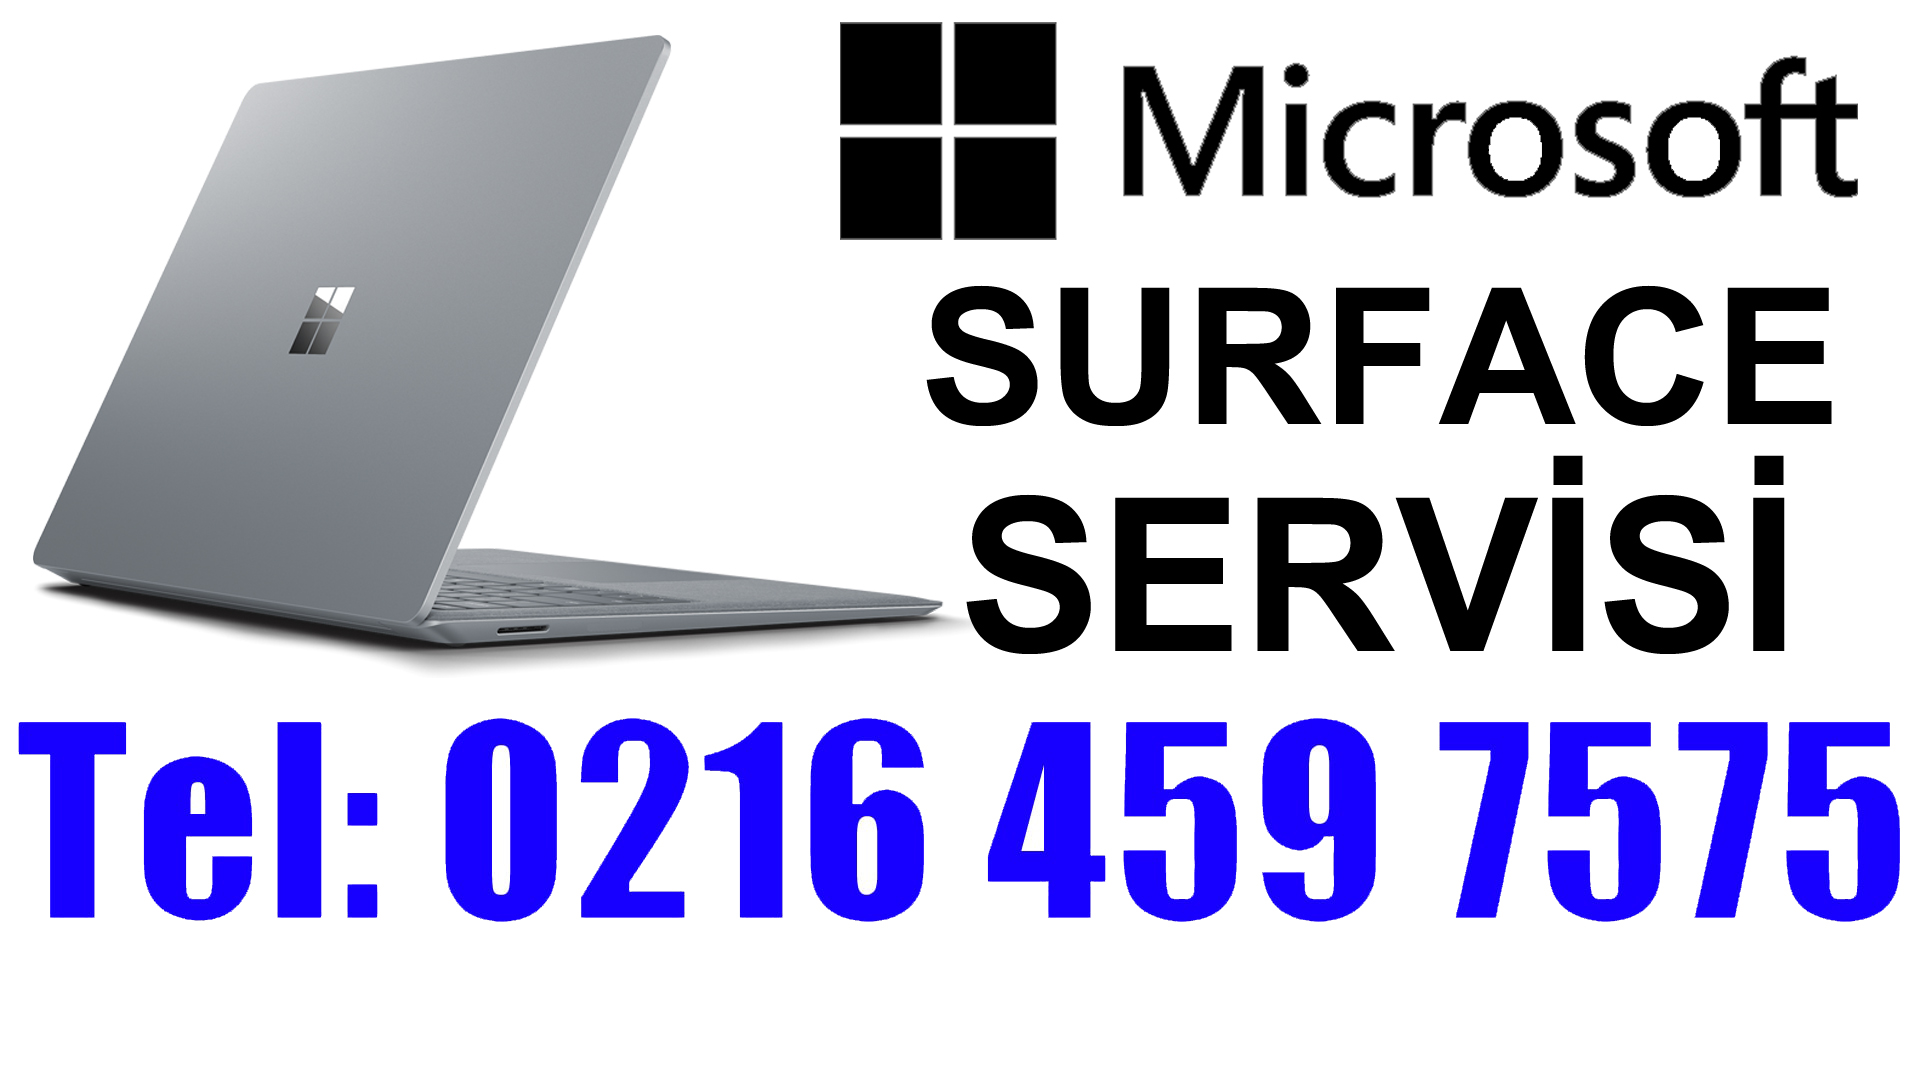 Microsoft Surface Servis